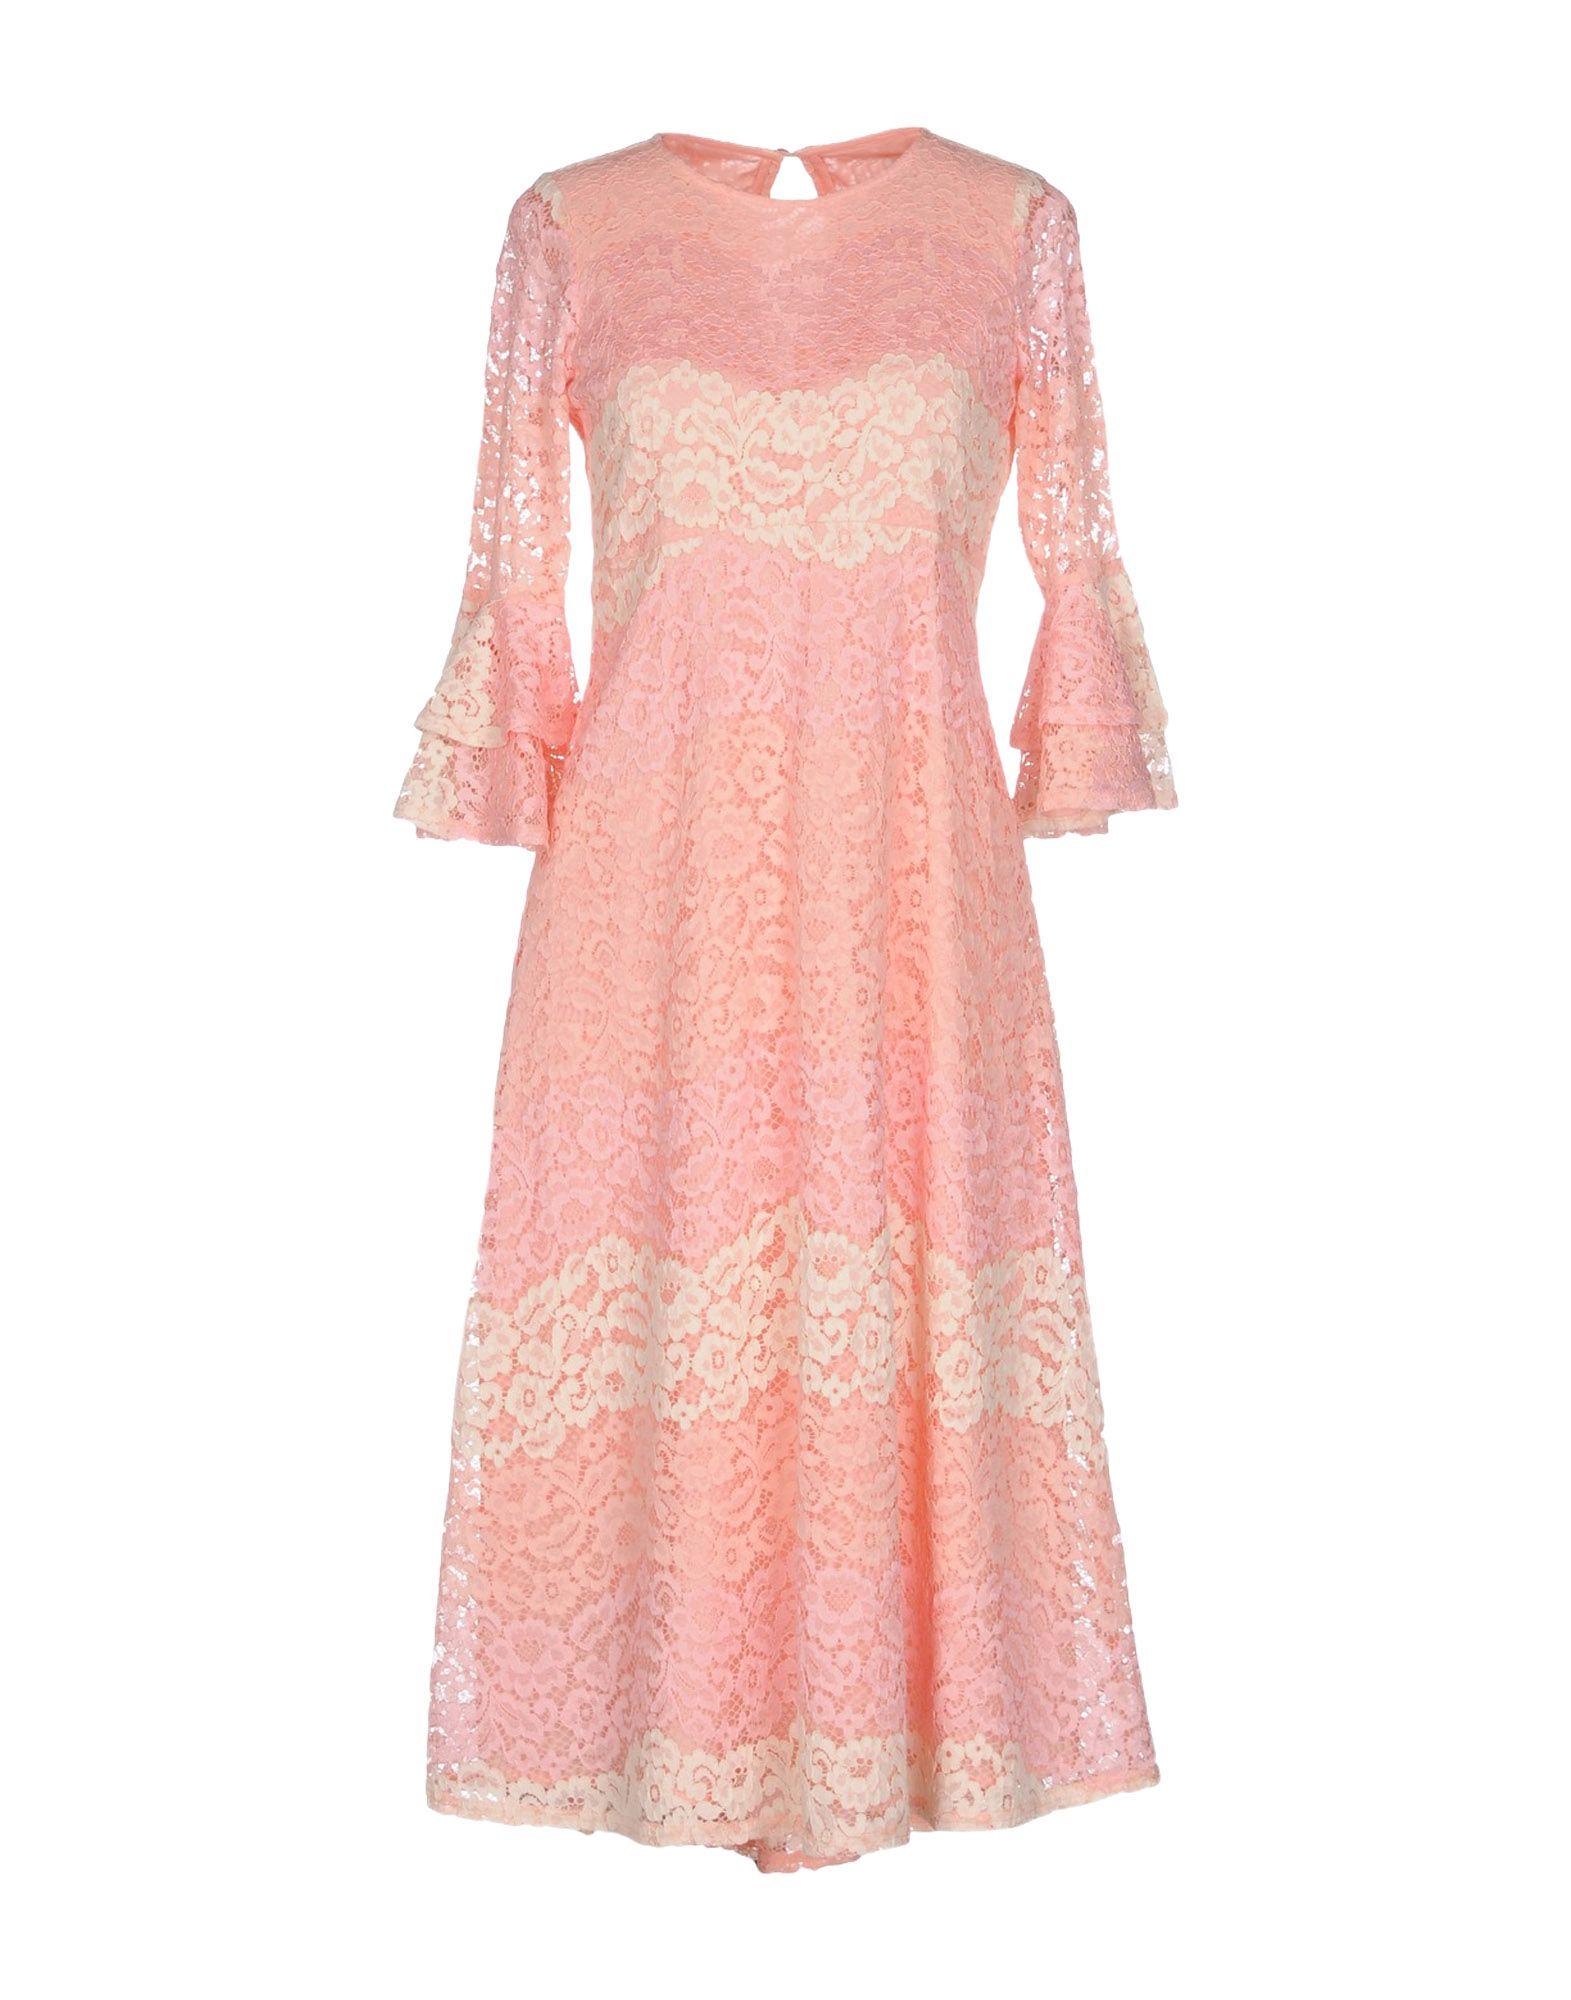 TRAFFIC PEOPLE Платье длиной 3/4 lisa corti платье длиной 3 4